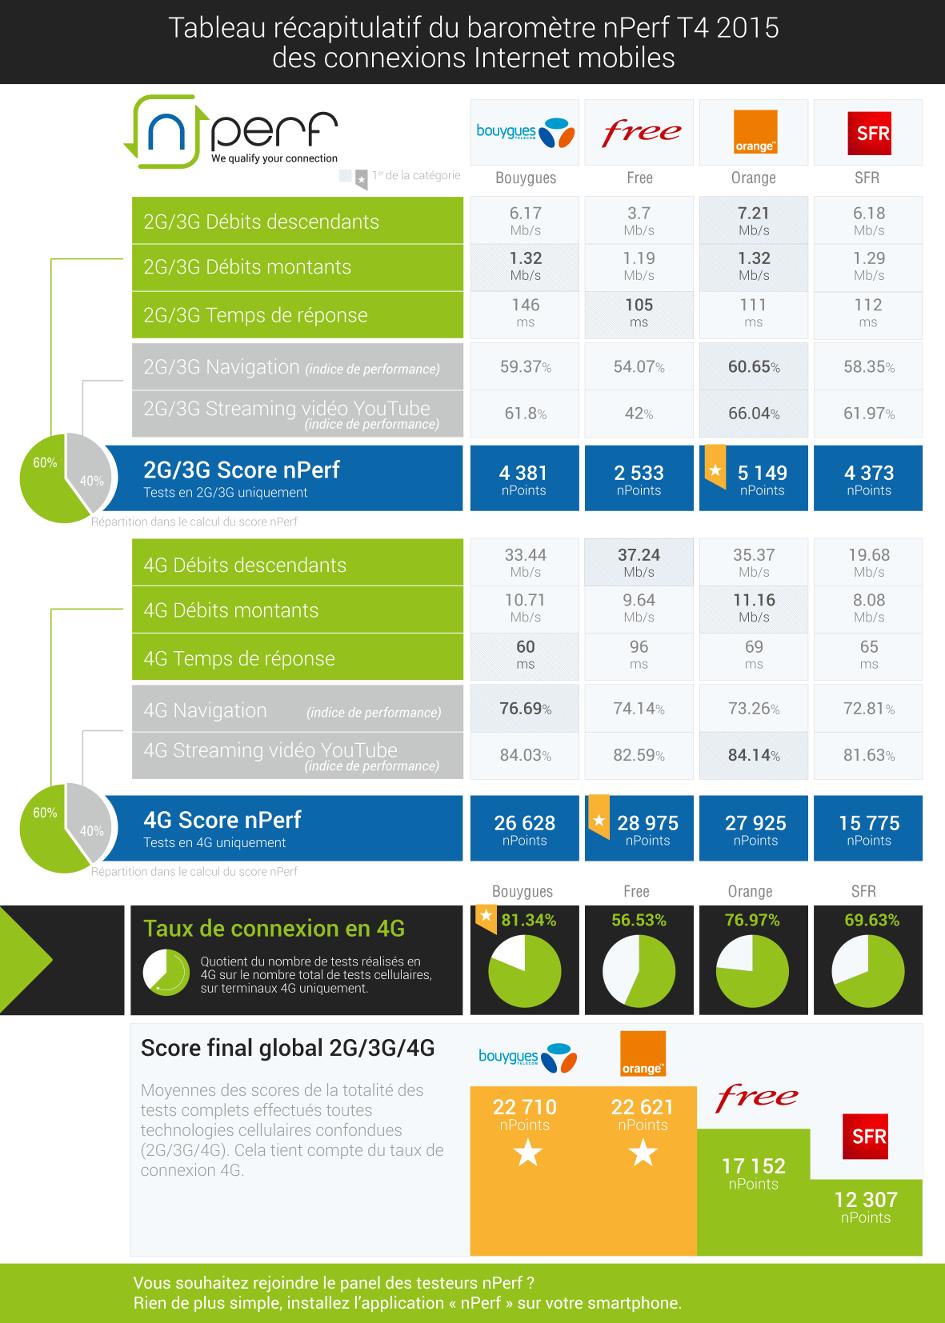 nperf-connexions-internet-mobiles-t4-2015